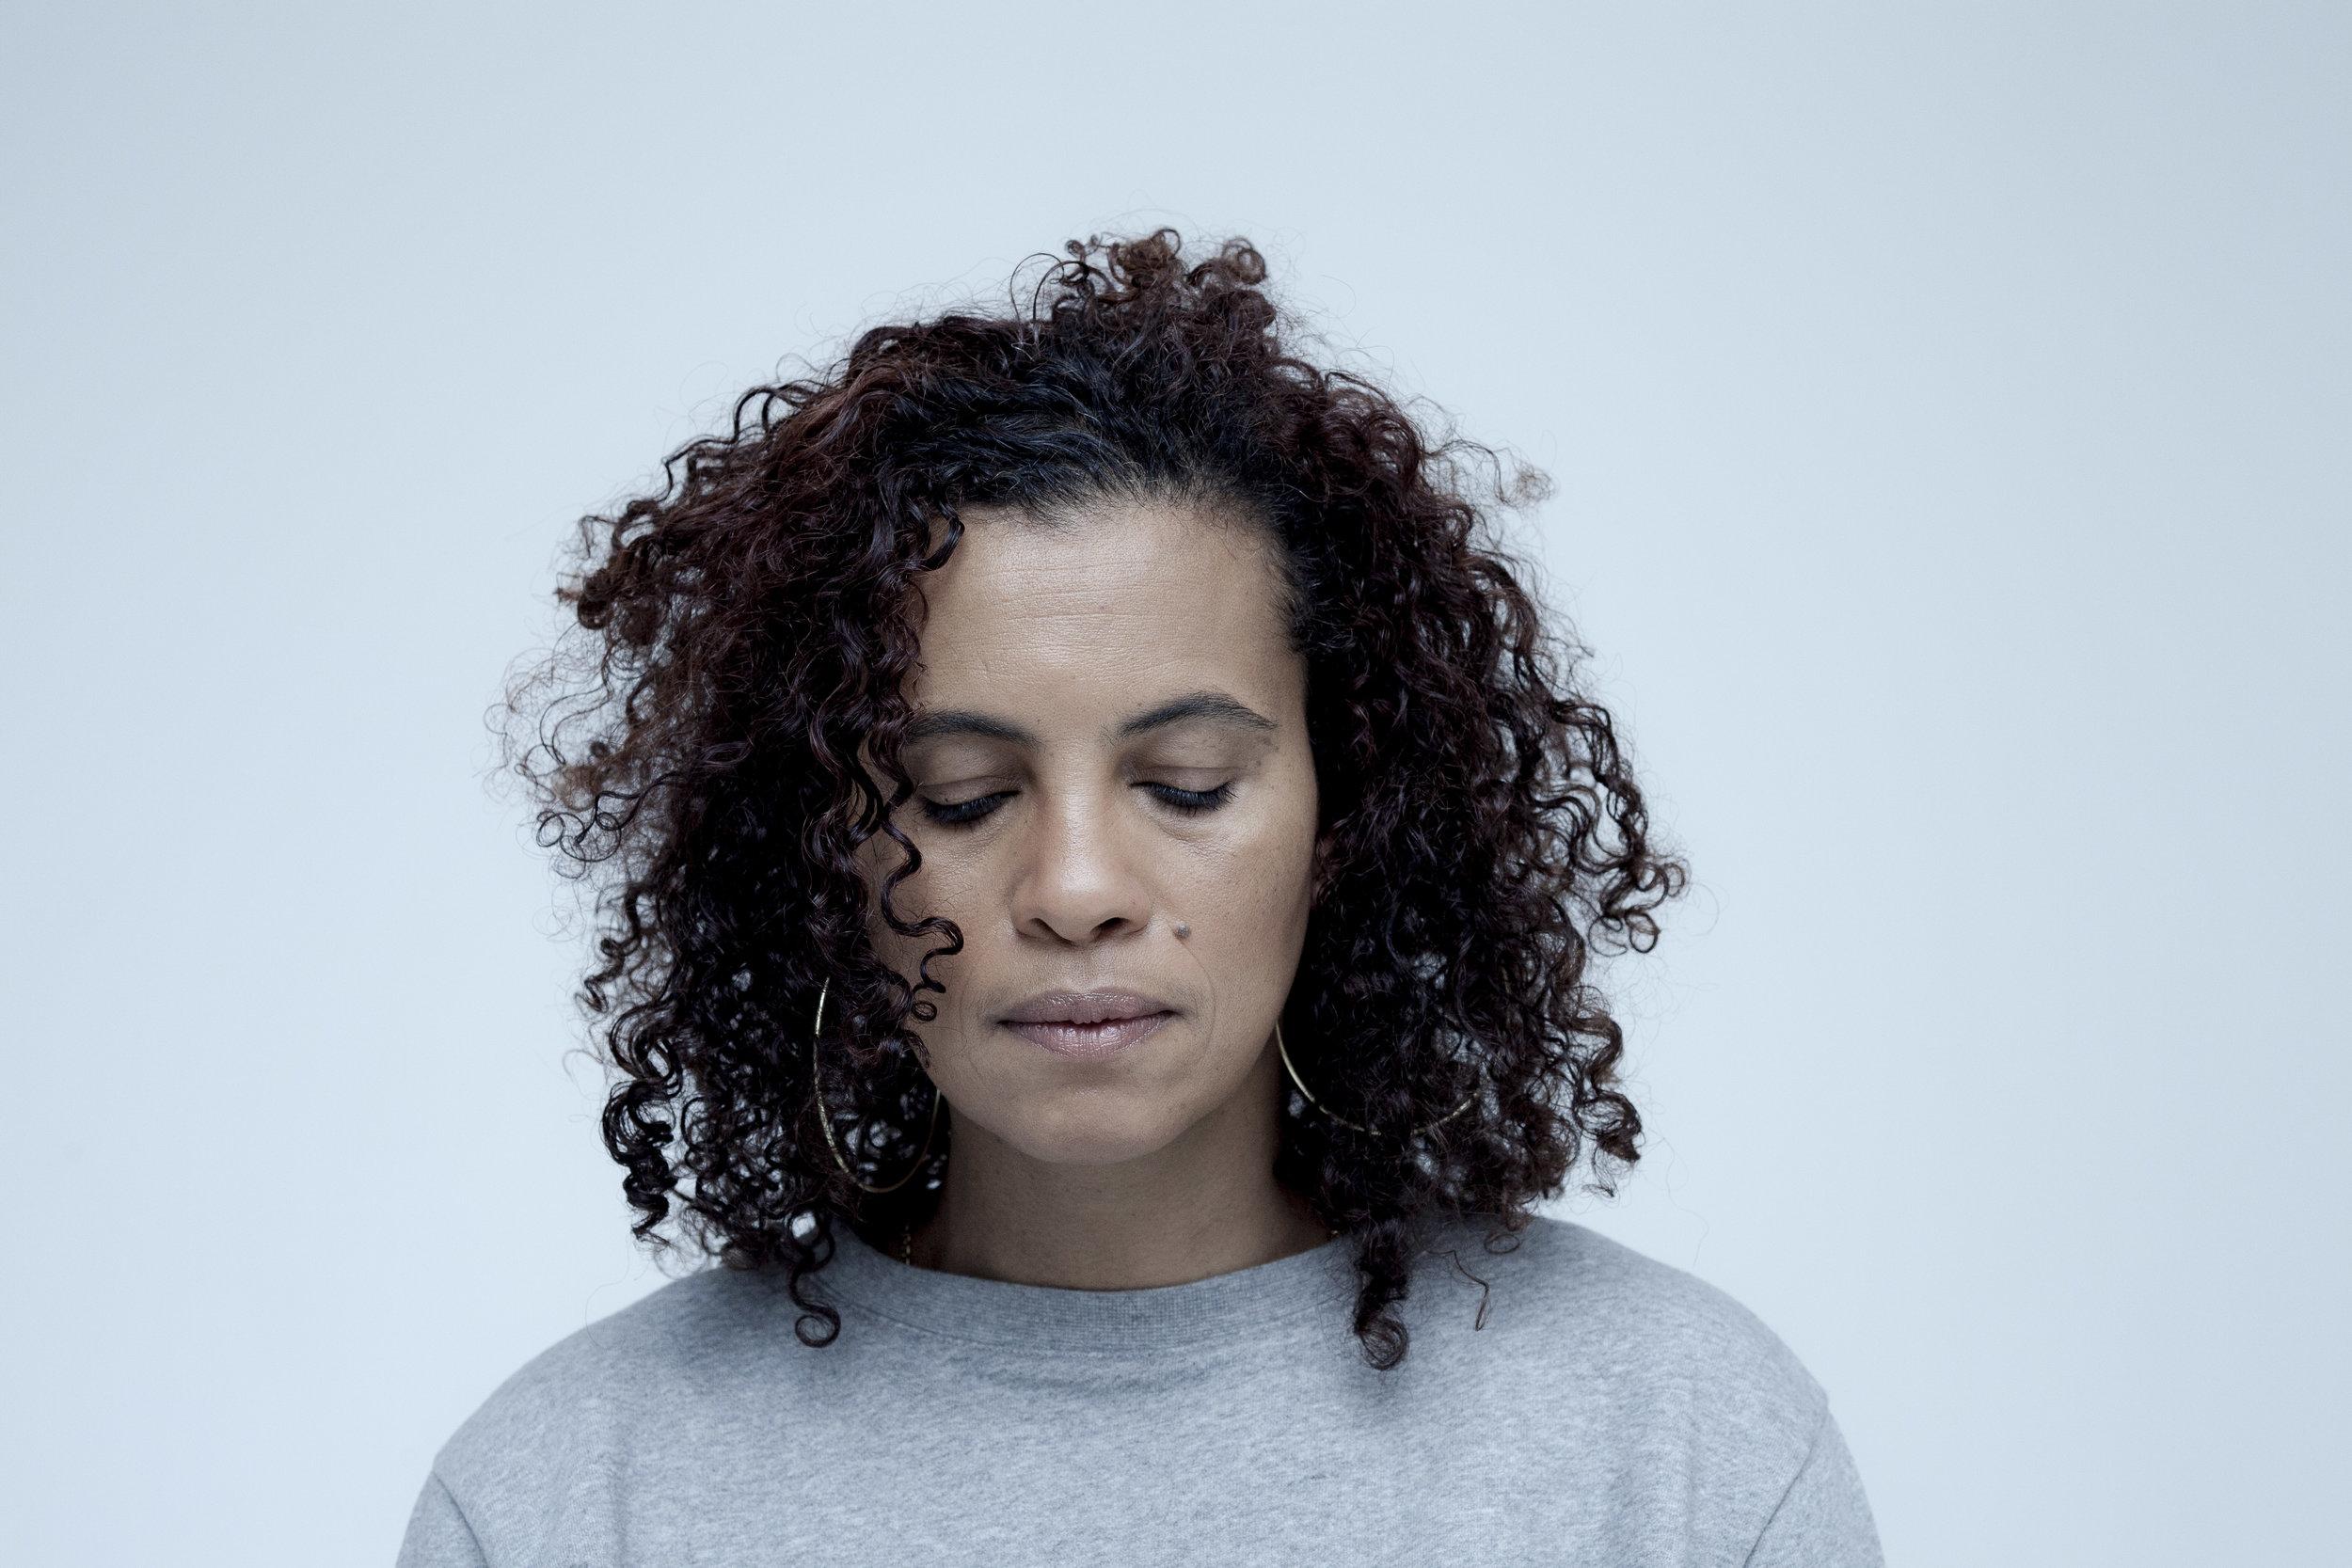 Neneh Cherry, Singer - The Working Woman's Handbook